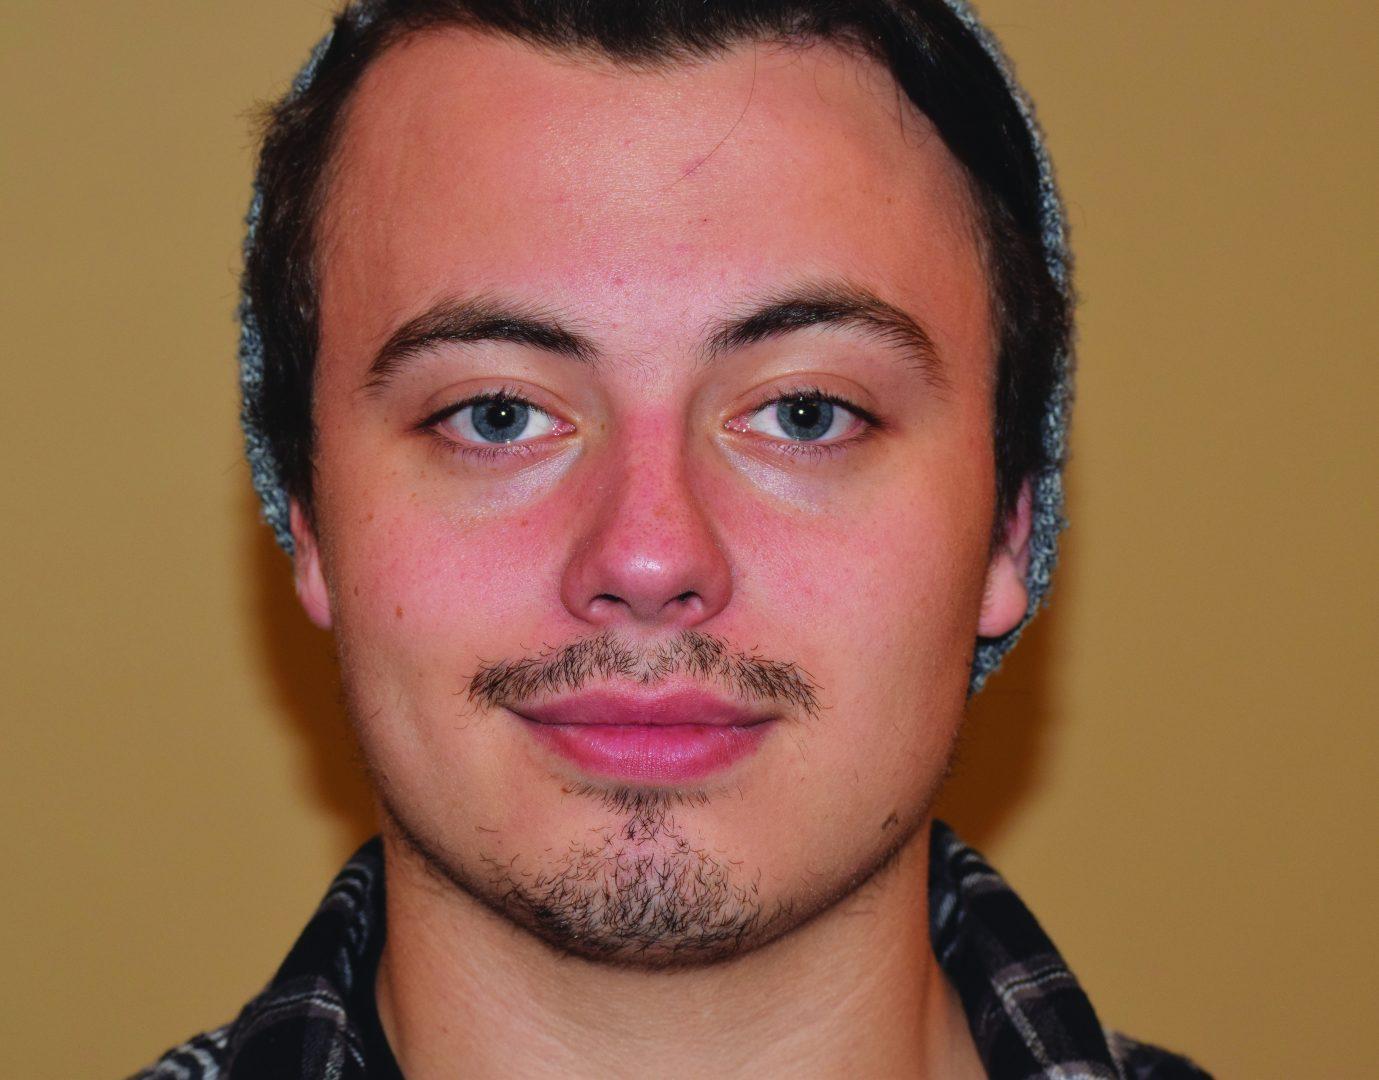 Movember: Moustaches for Men's Health